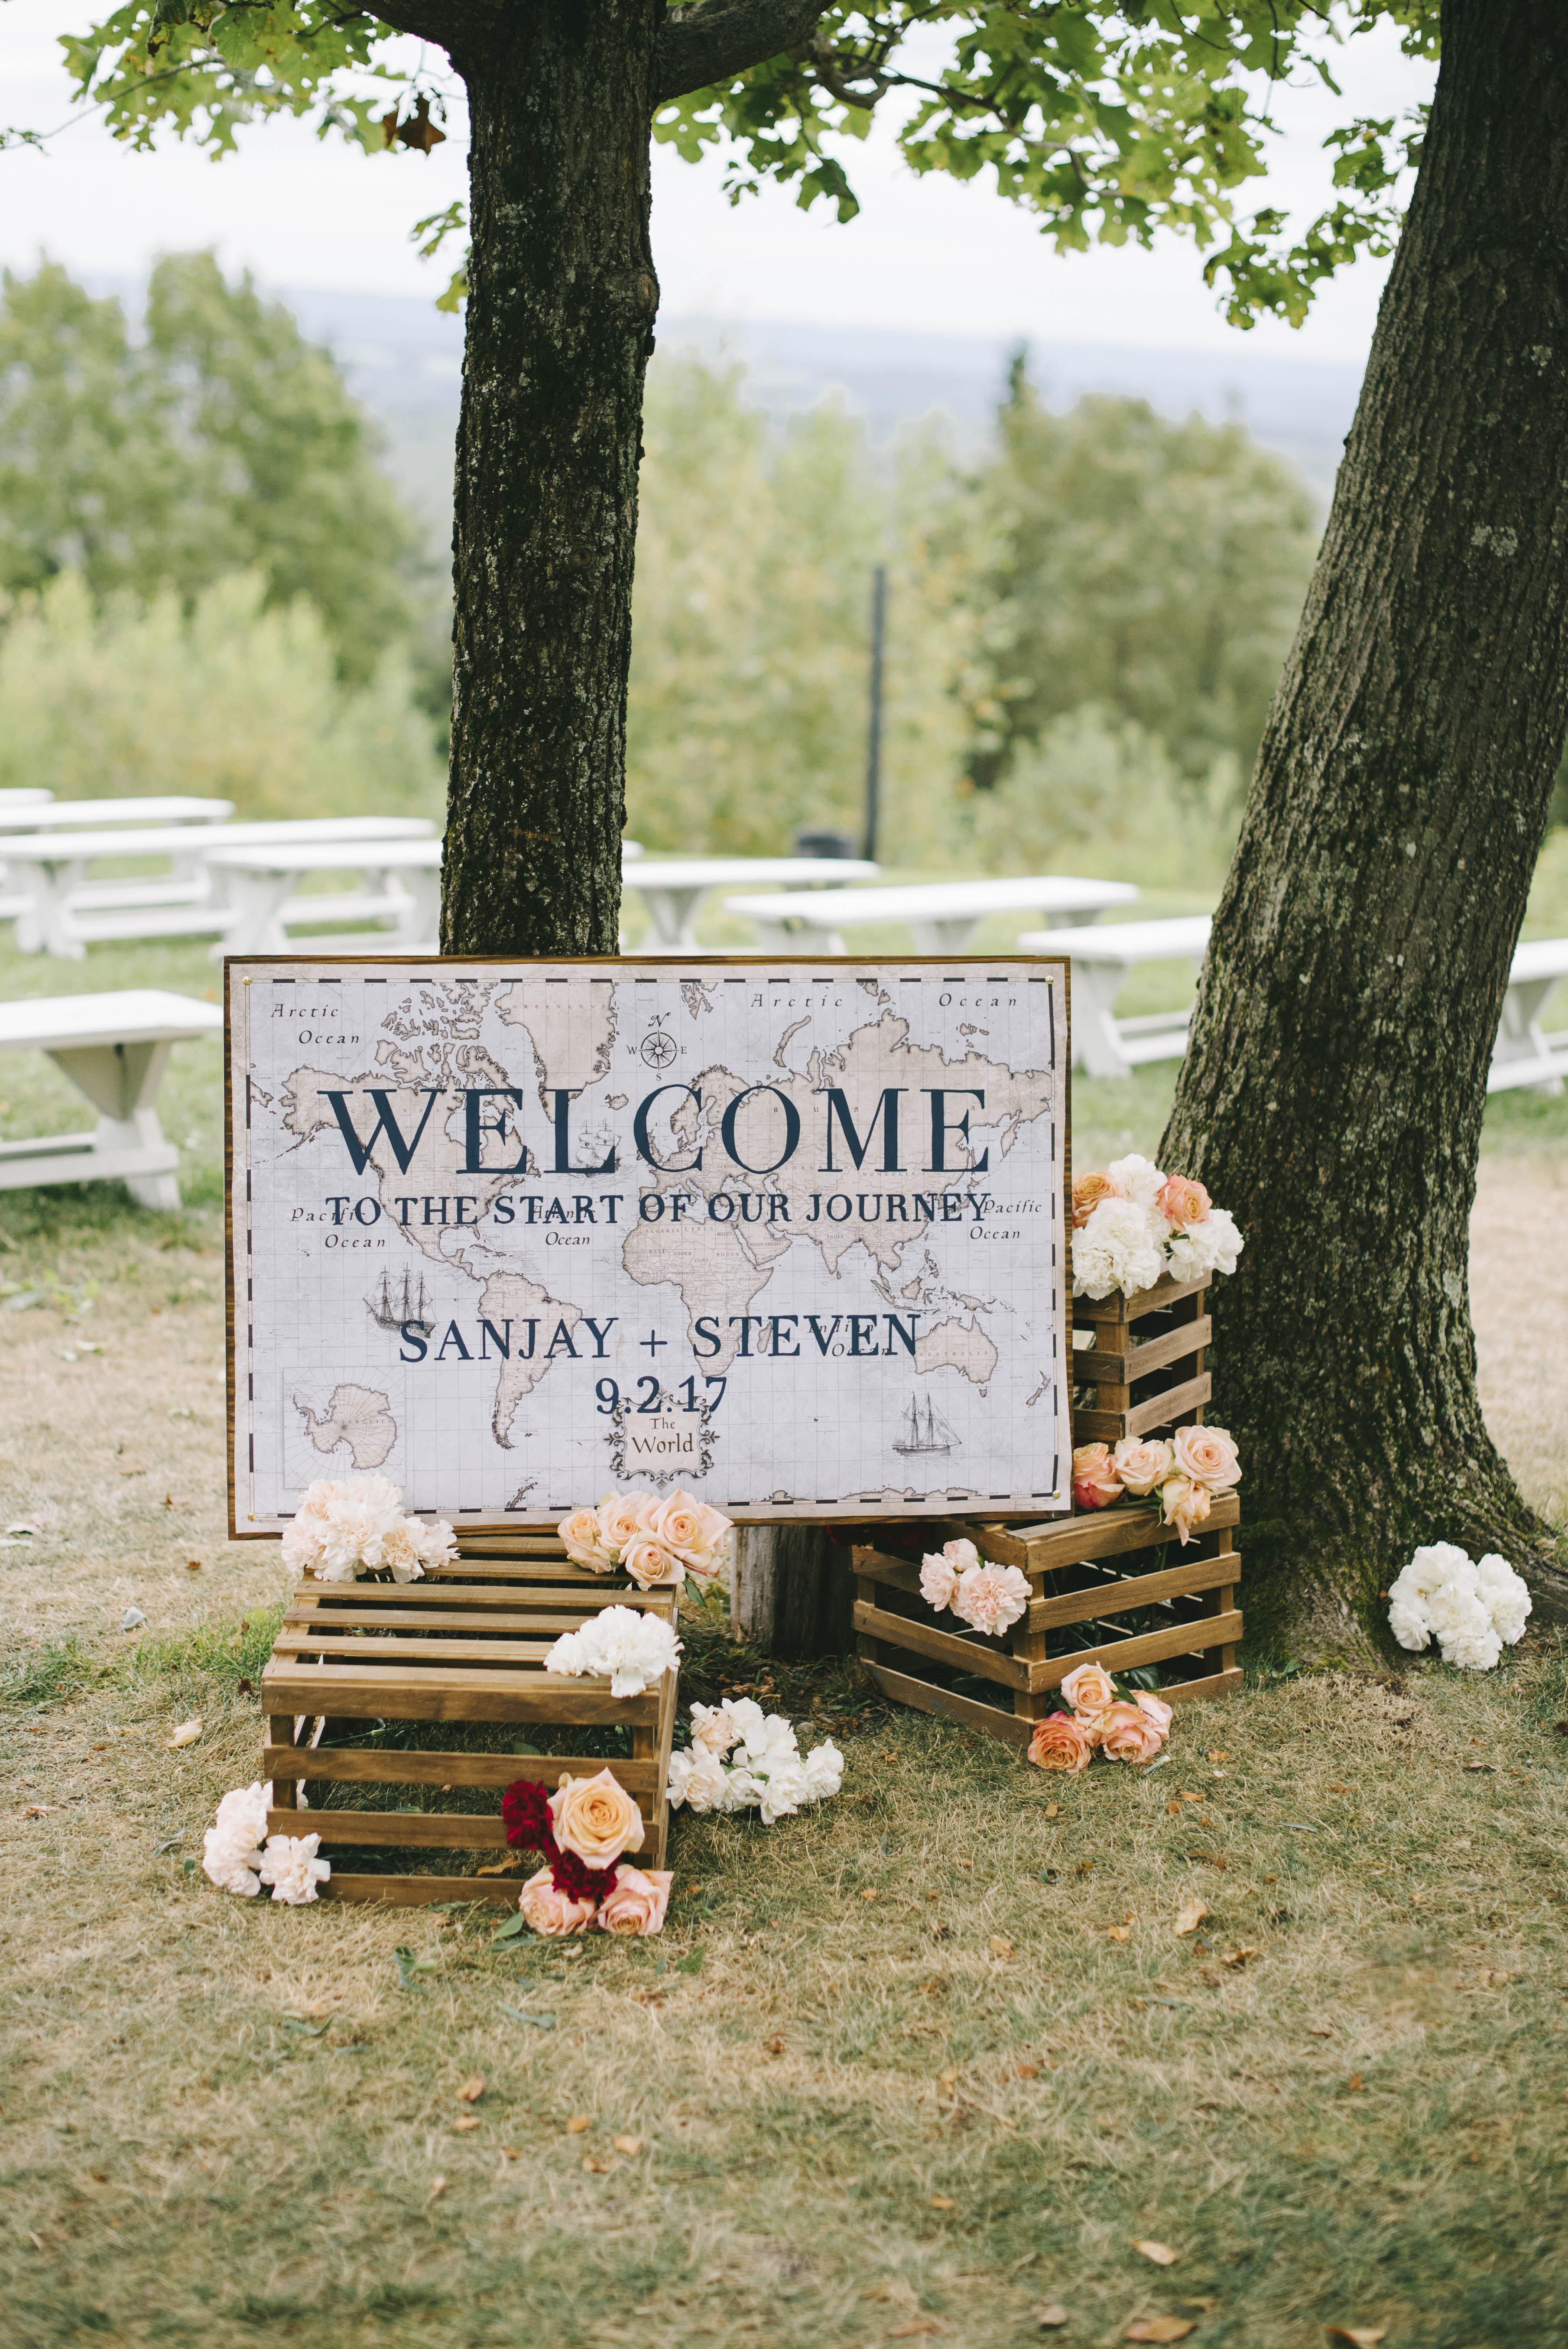 sanjay steven wedding welcome signage